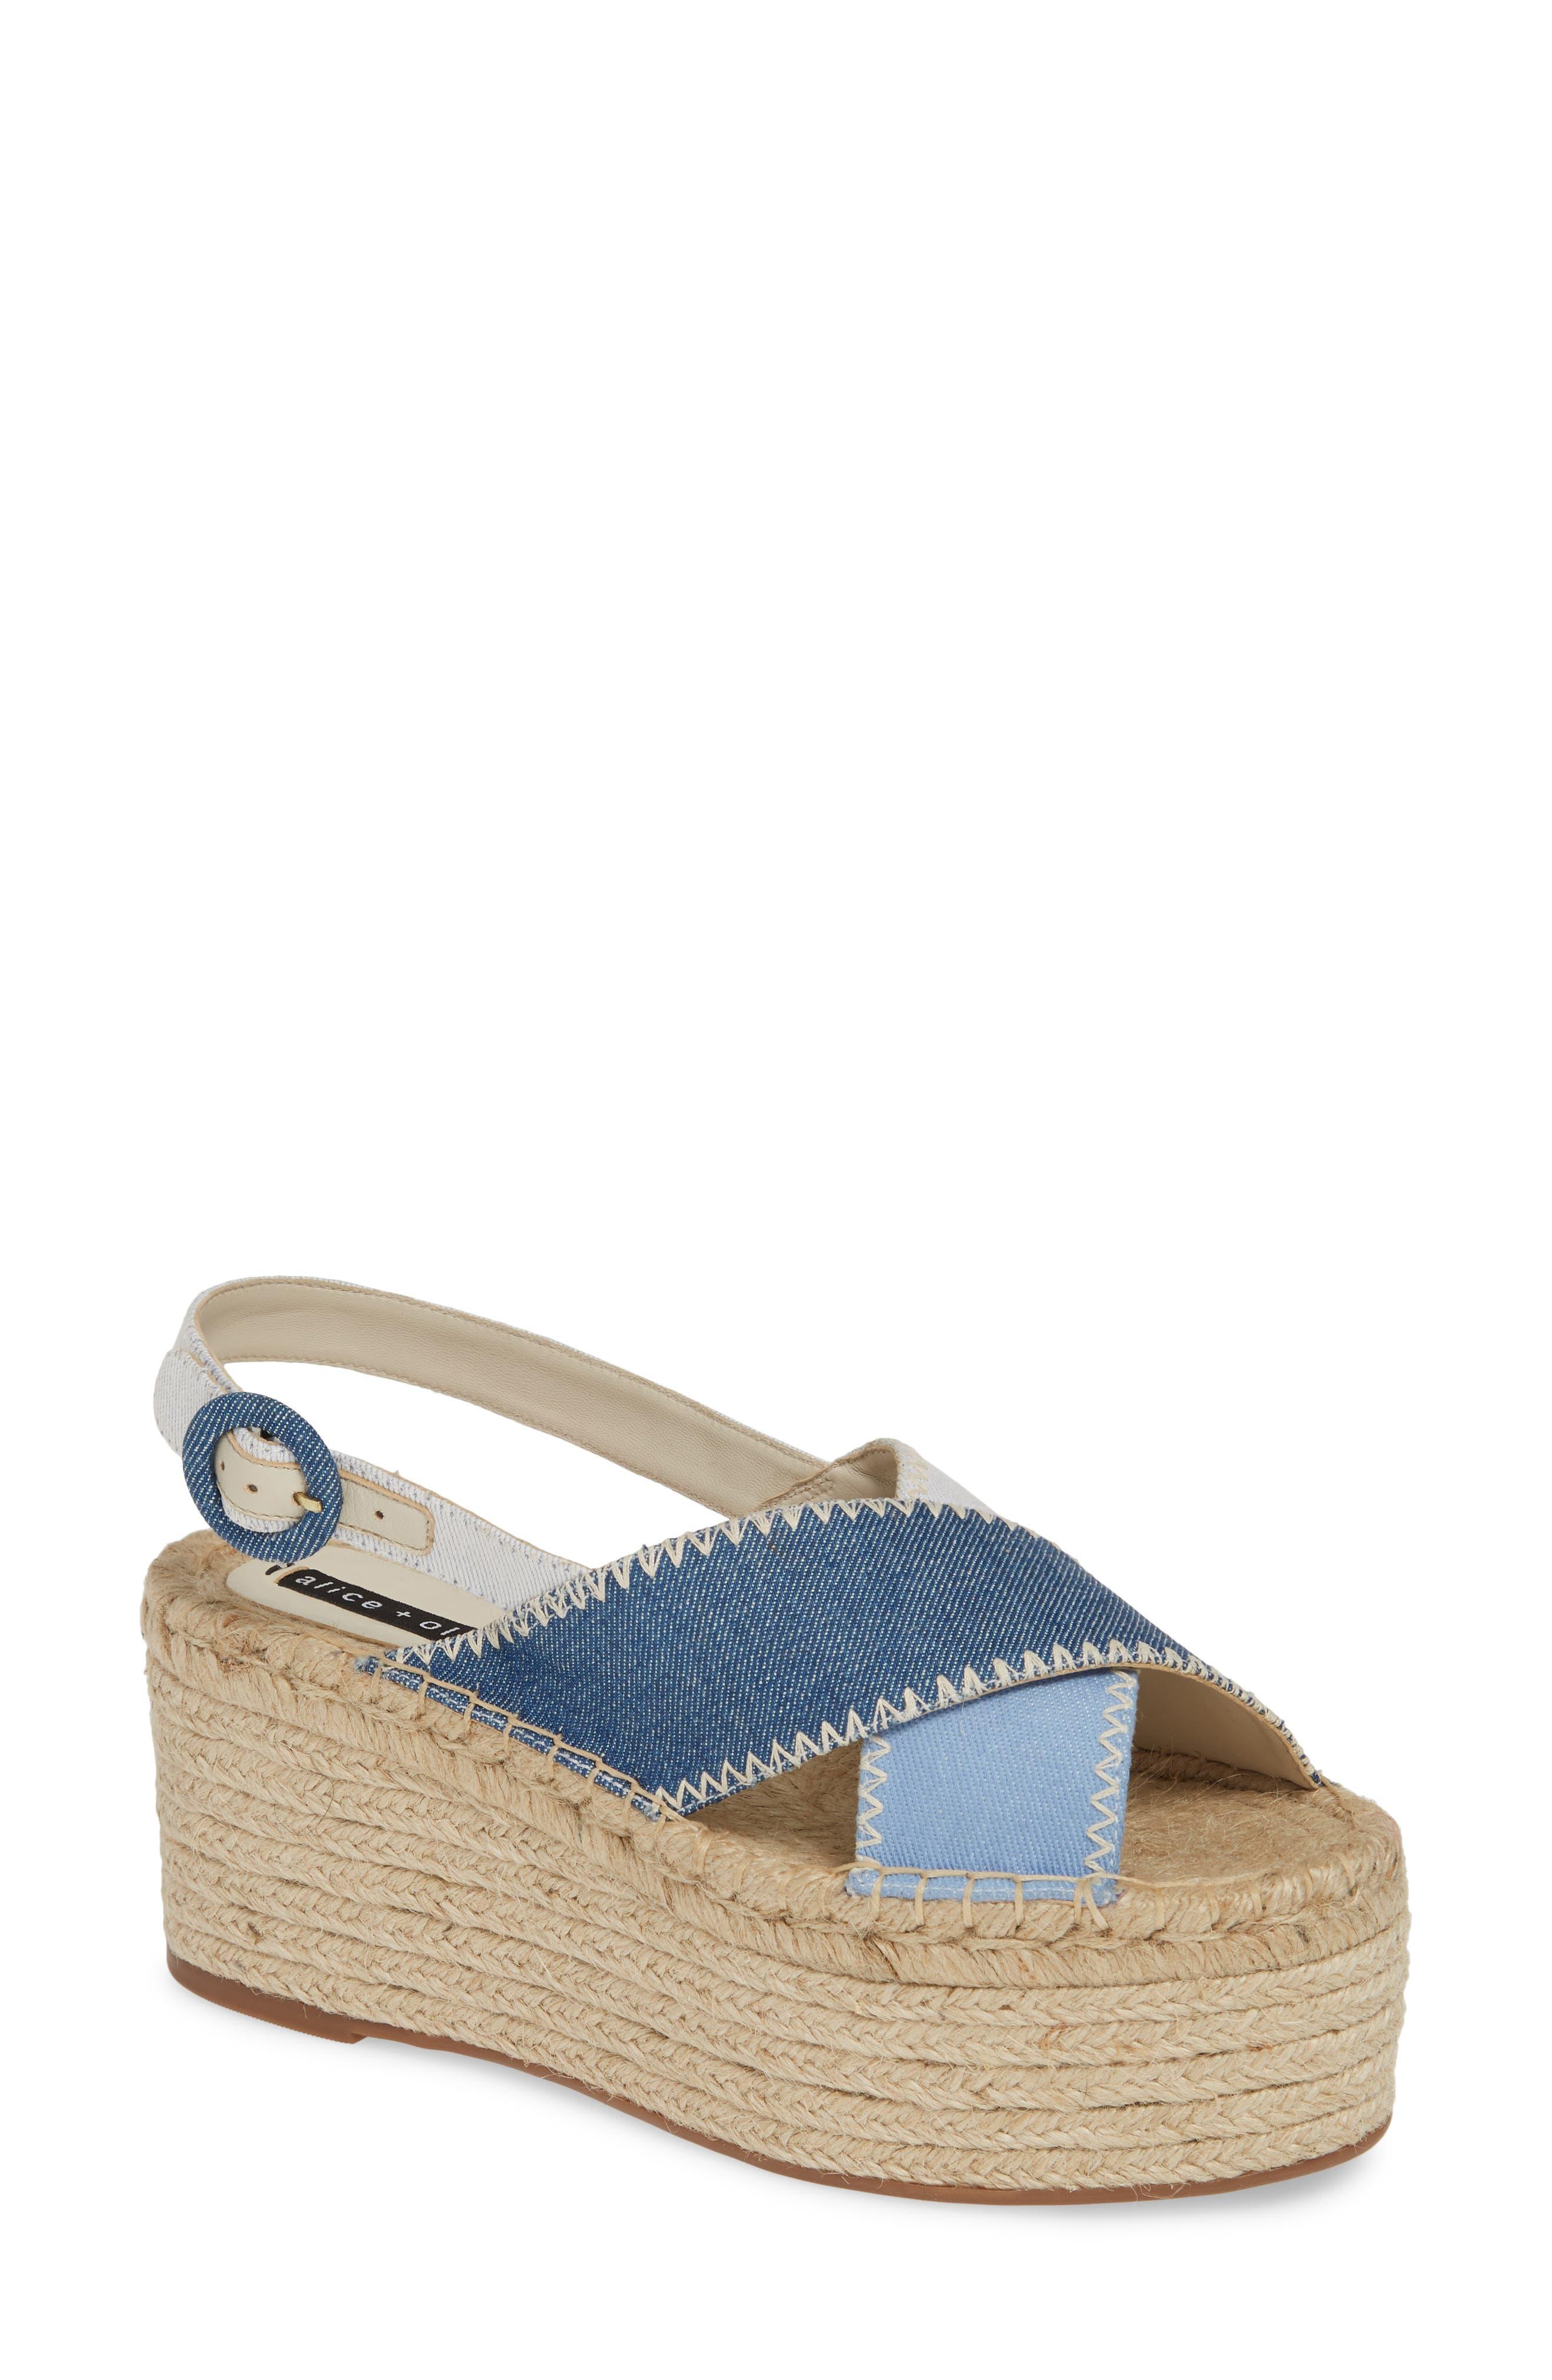 ALICE + OLIVIA, Fayen Platform Sandal, Main thumbnail 1, color, DARK BLUE/ LIGHT BLUE/ IVORY